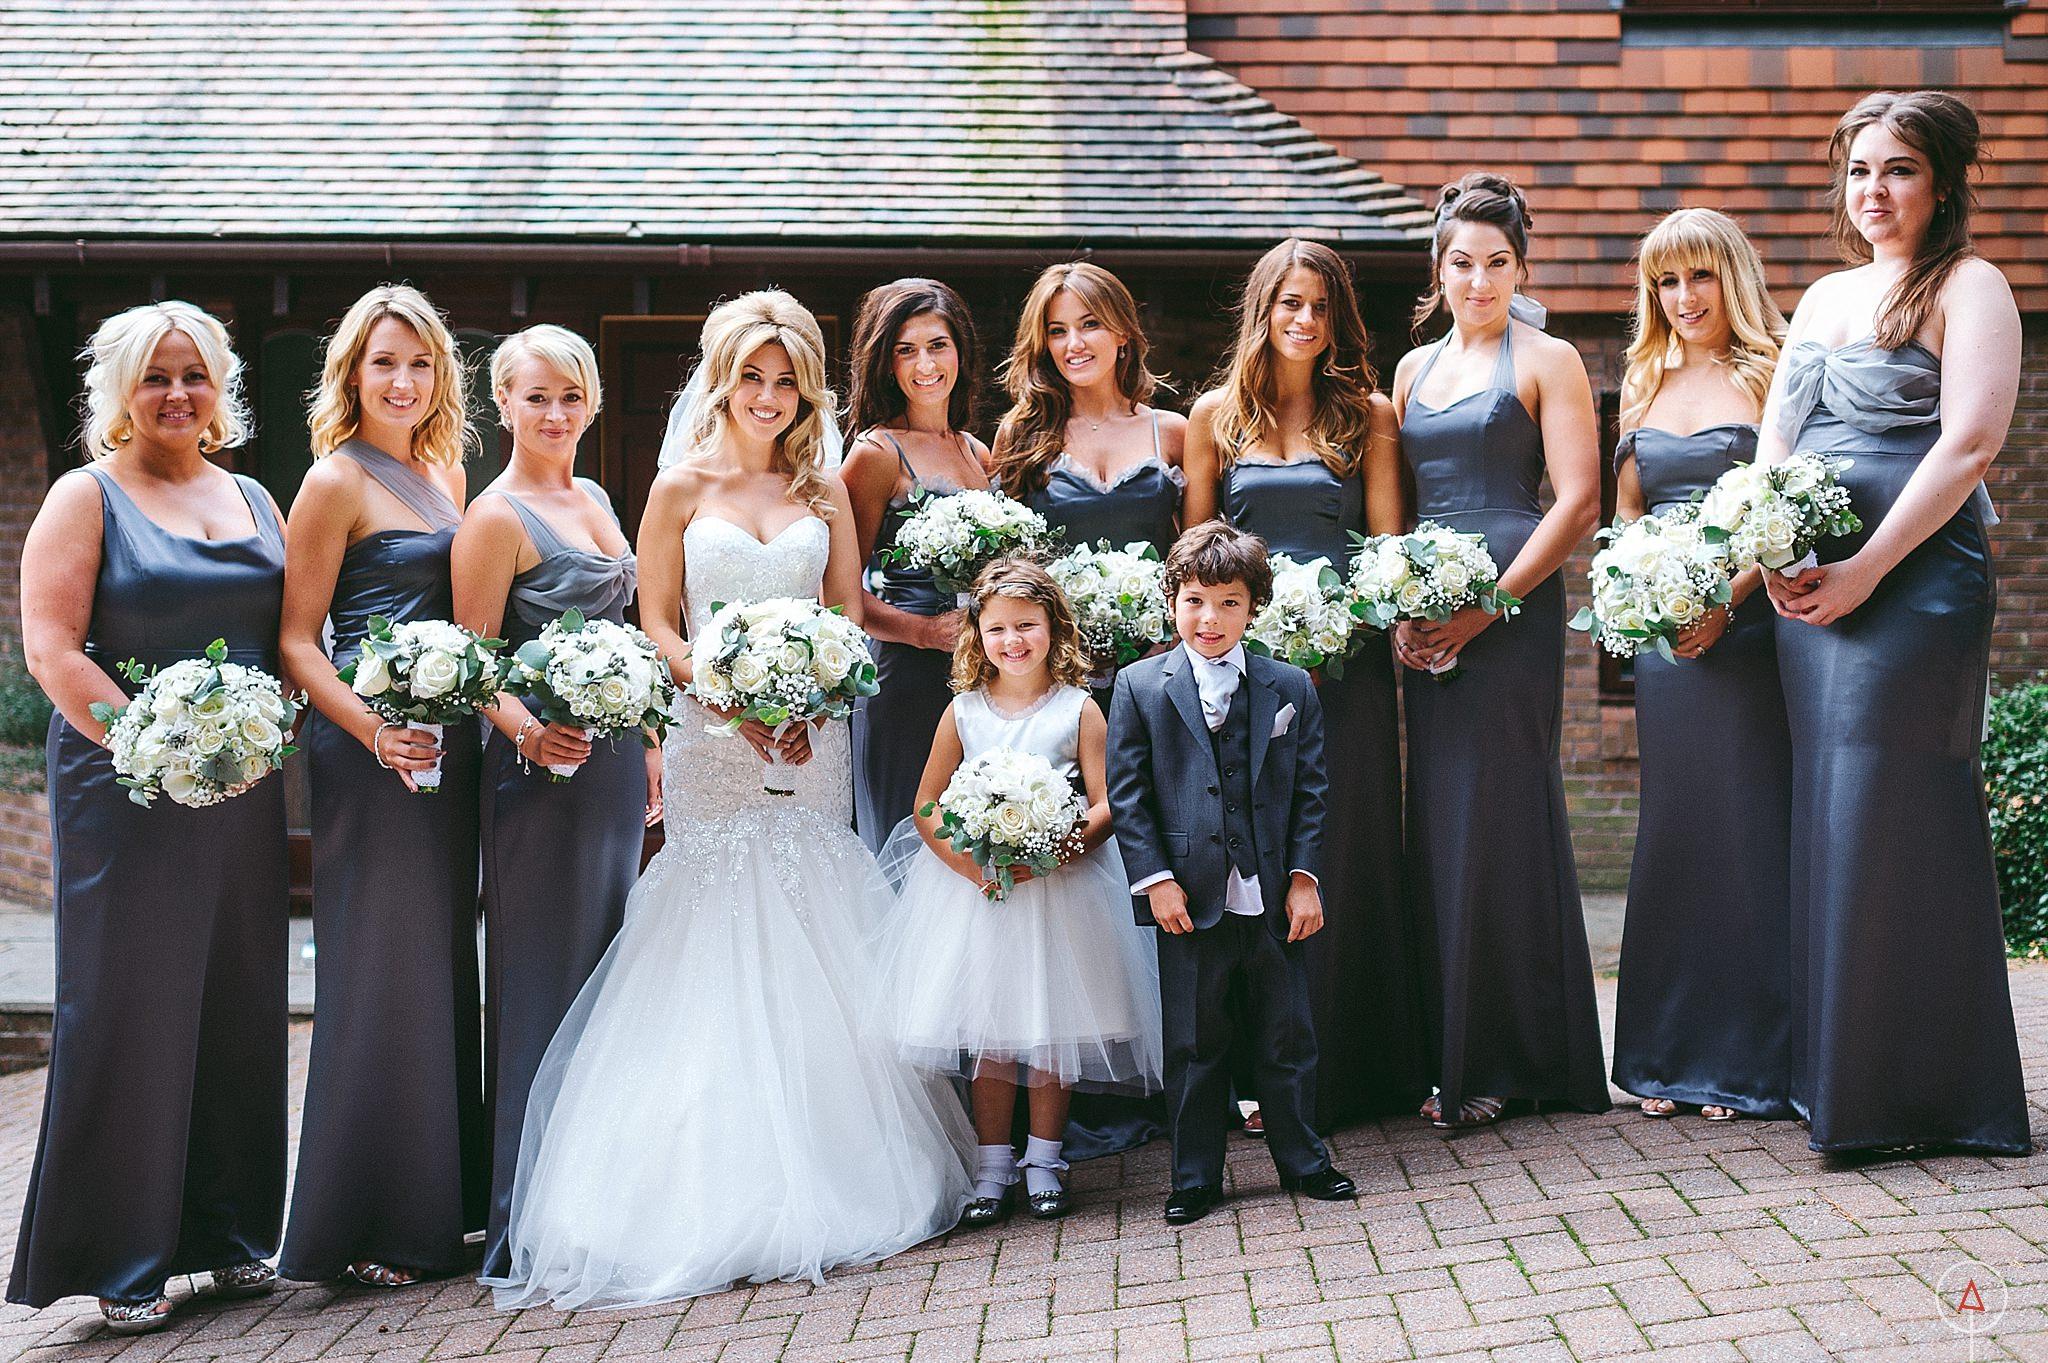 cardiff-wedding-photographer-aga-tomaszek_0418